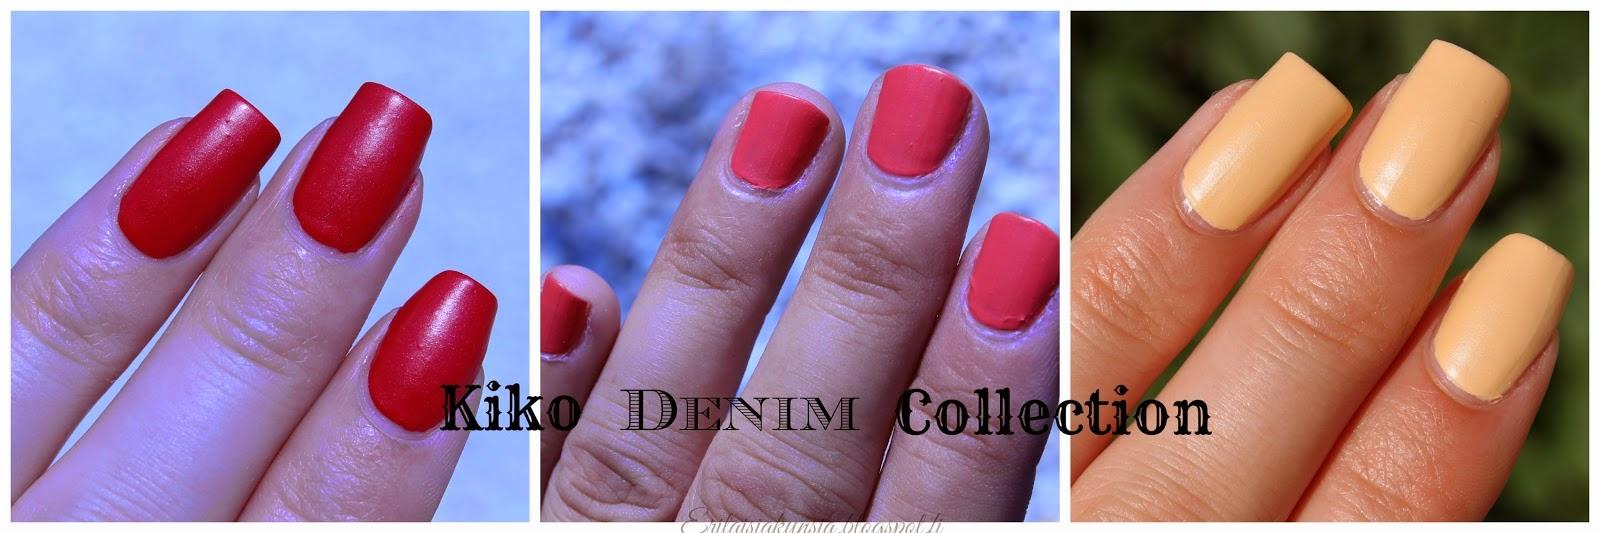 http://erilaisiakynsia.blogspot.fi/2014/08/220-kiko-denim-swatch.html